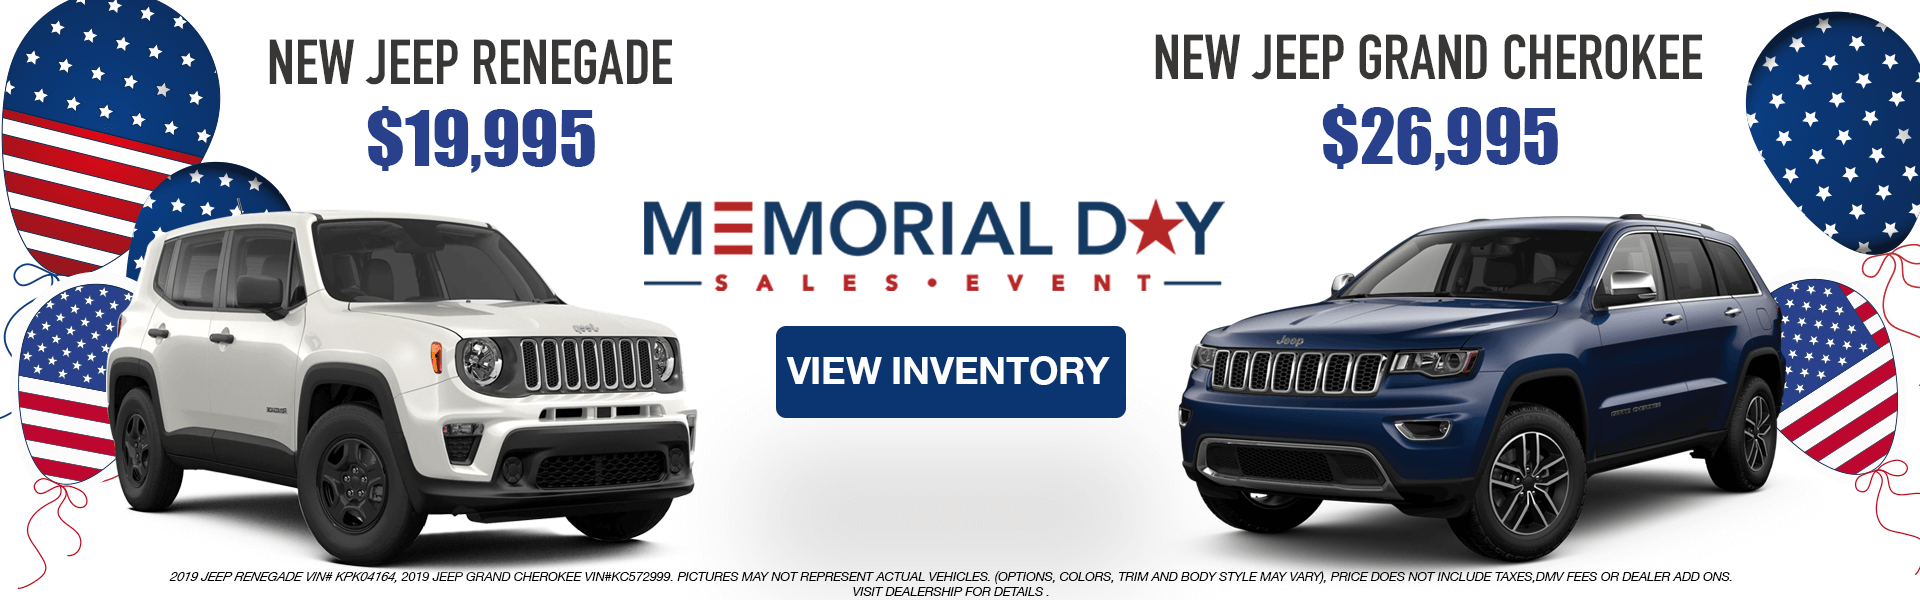 Jeeps: Renegade, Grand Cherokee